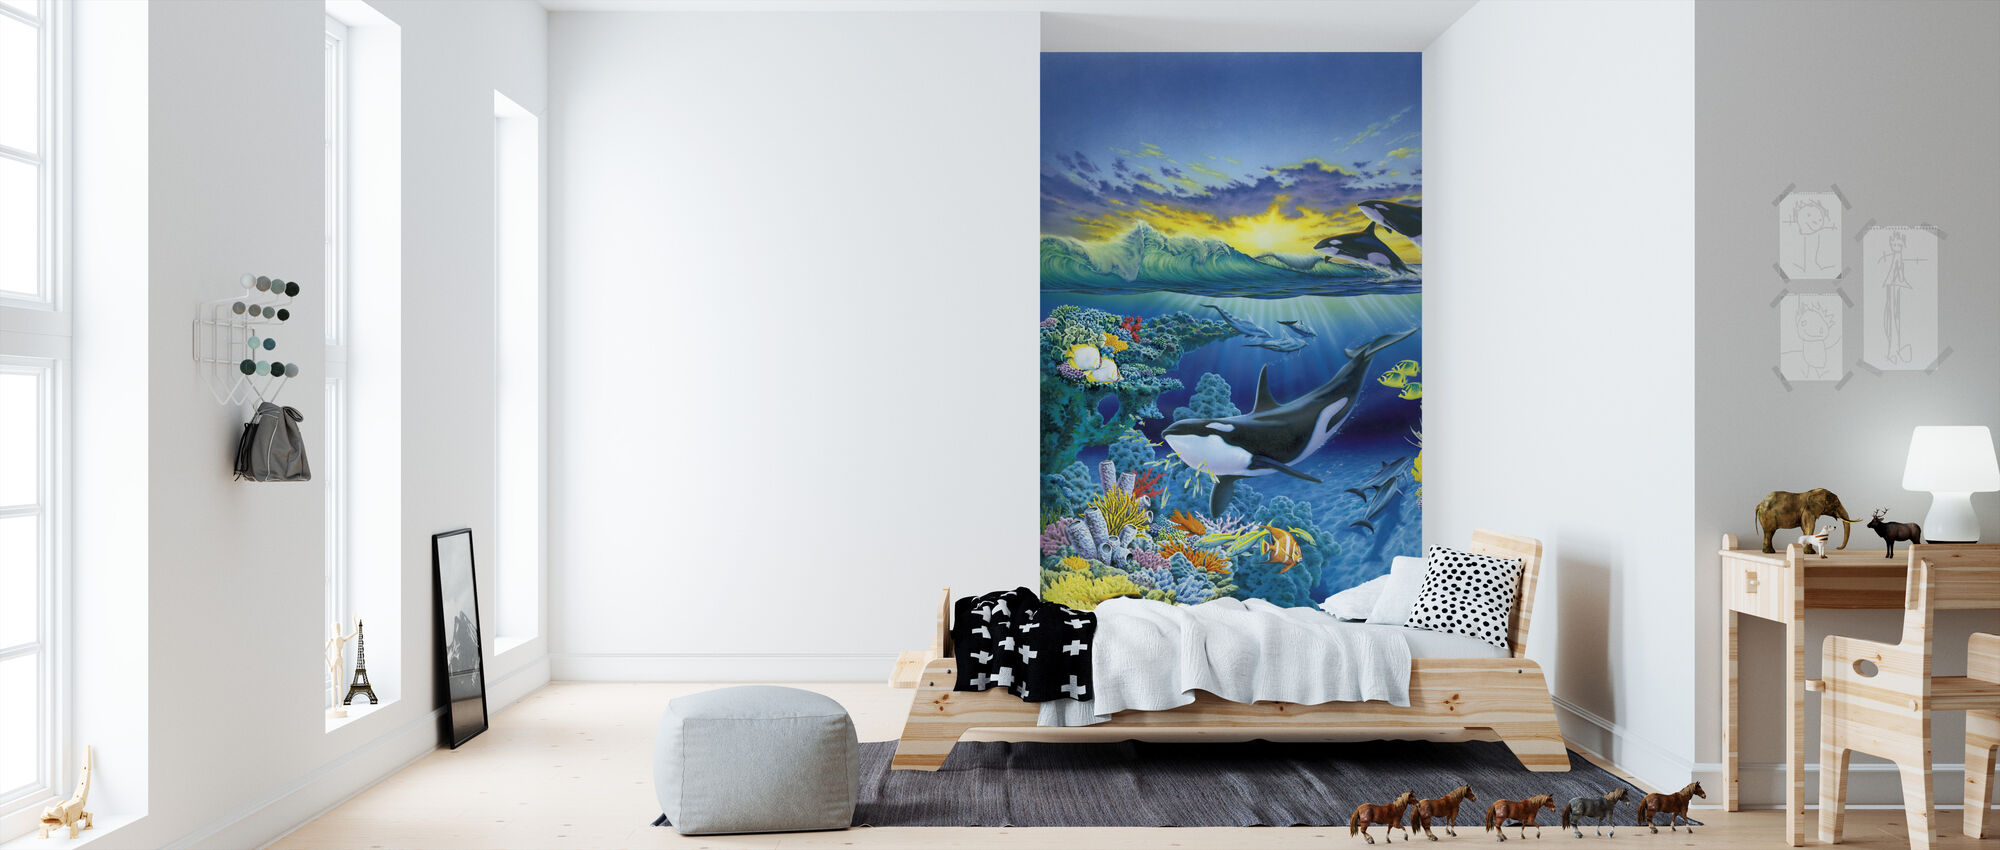 Living Ocean - Orca - Wallpaper - Kids Room